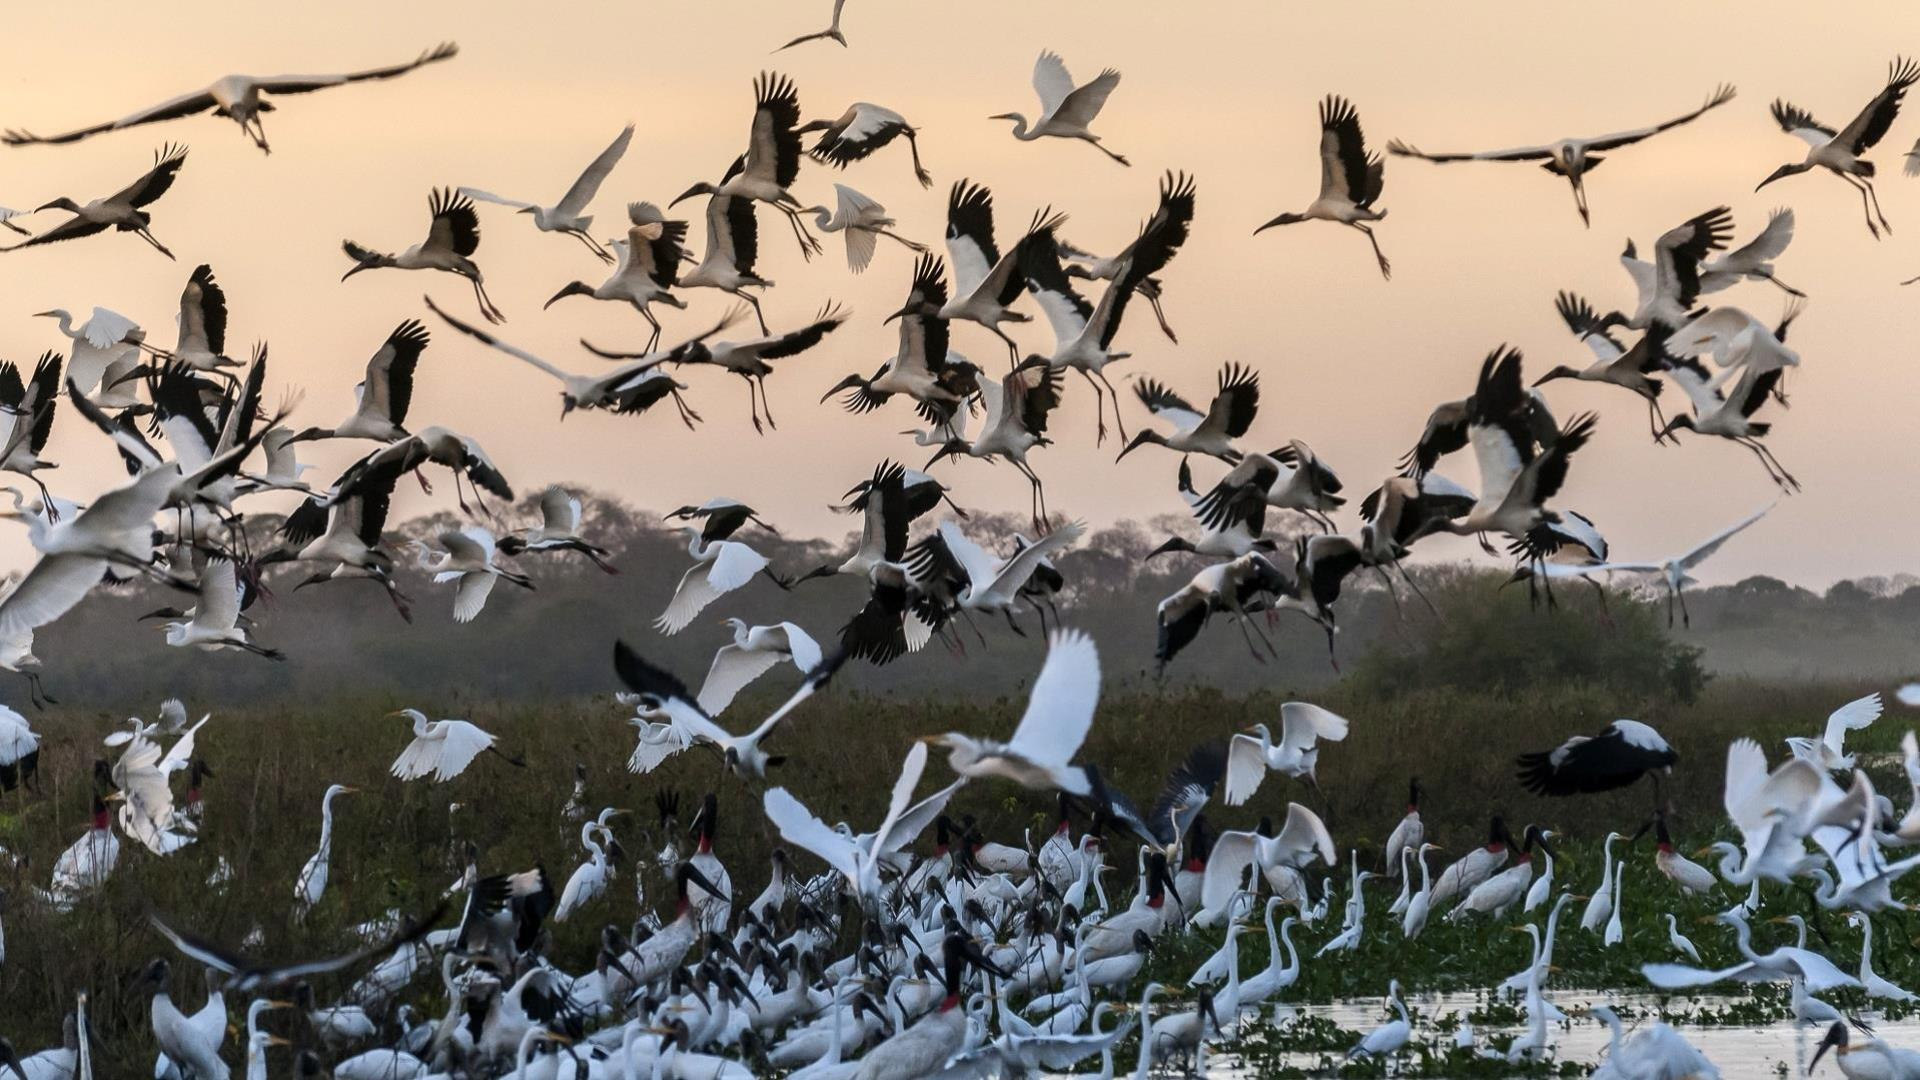 Brasilien Nord Pantanal: 11 Tage Reisebaustein - Natur Highlights in drei Ökosystemen